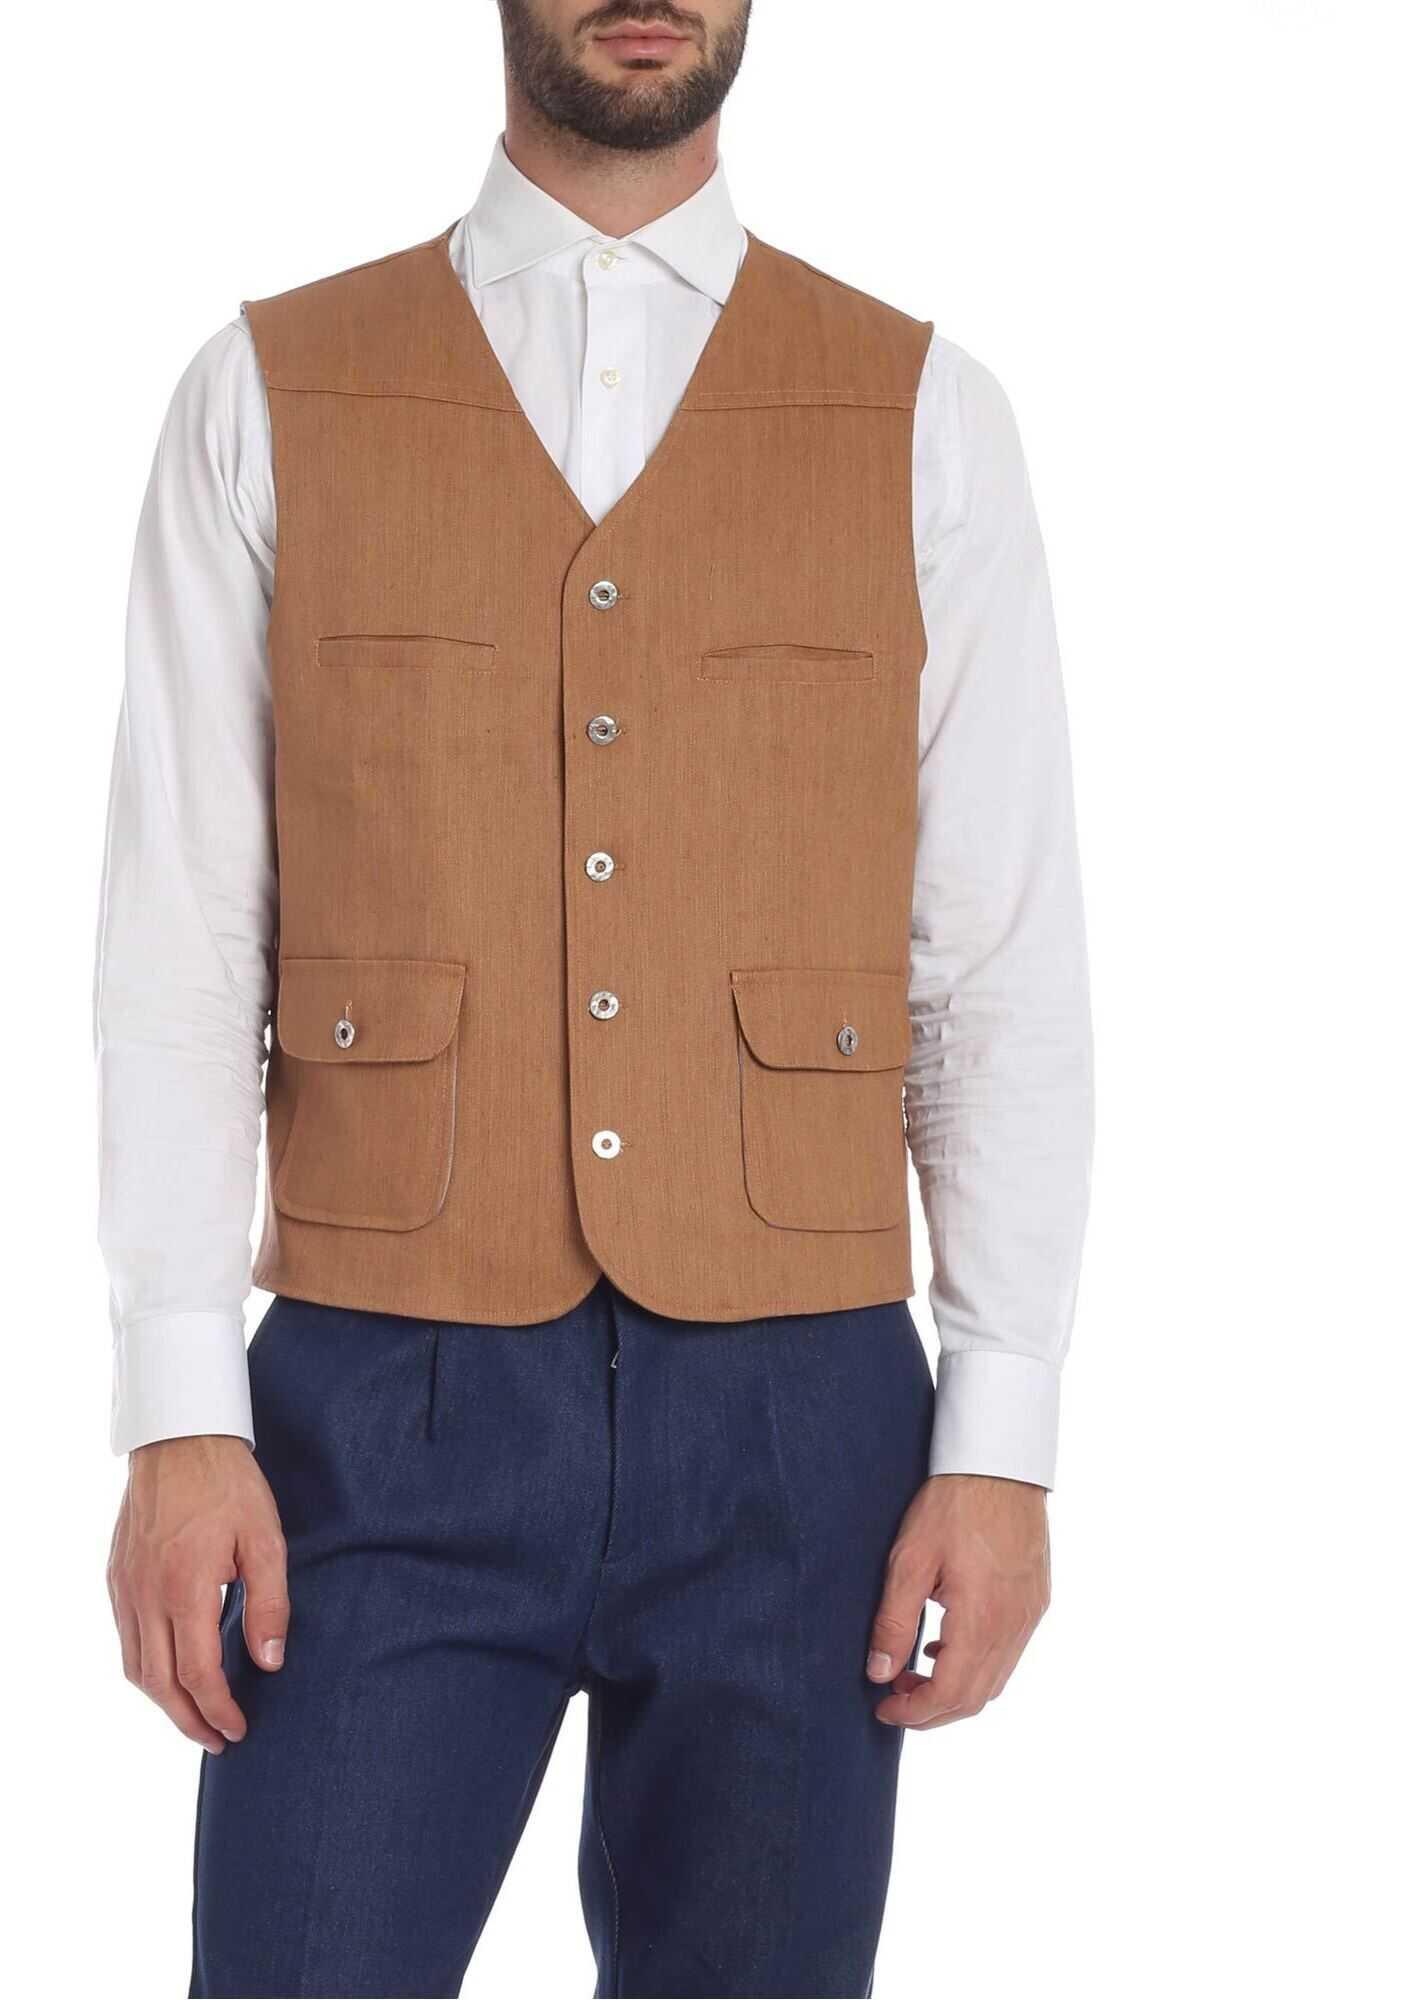 Ribbon Clothing Four-Pocket Brown Vest Brown imagine